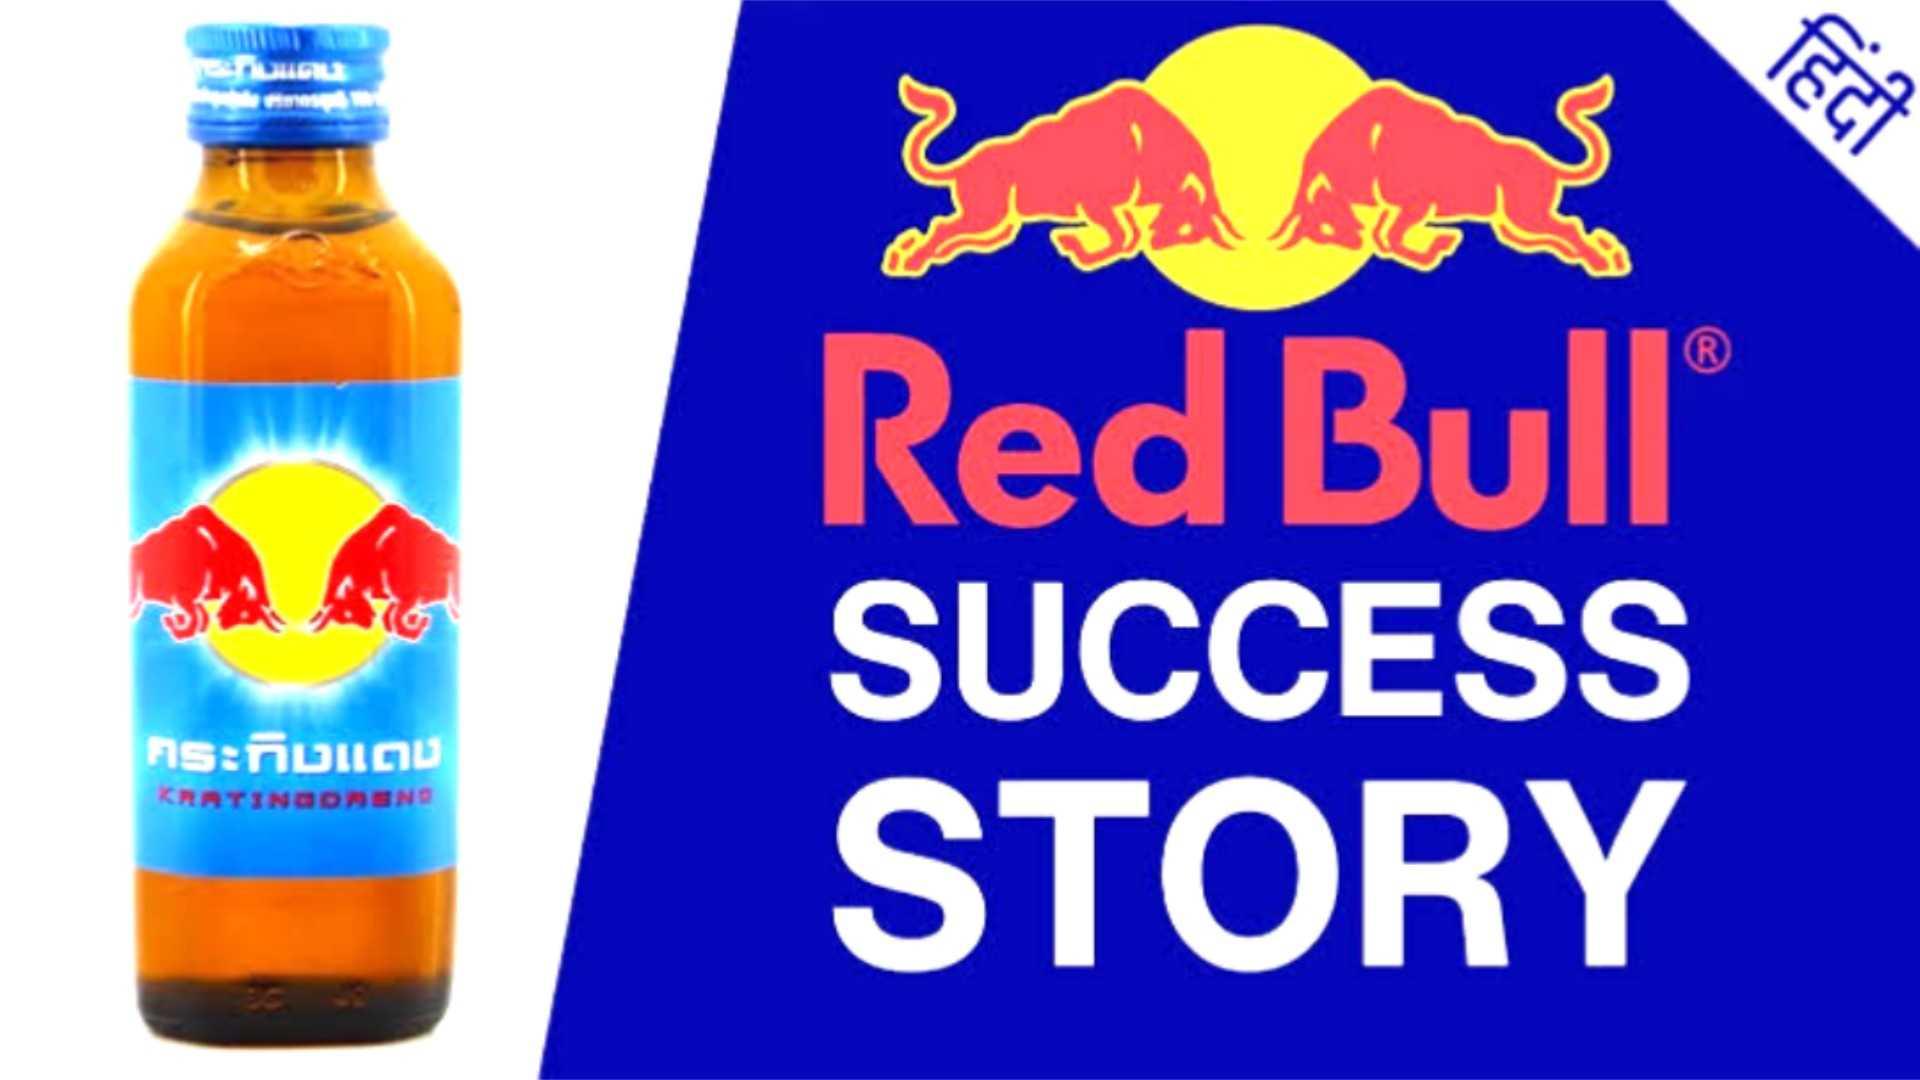 Red Bull Success Story In Hindi | रेड बुल्ल सक्सेस स्टोरी